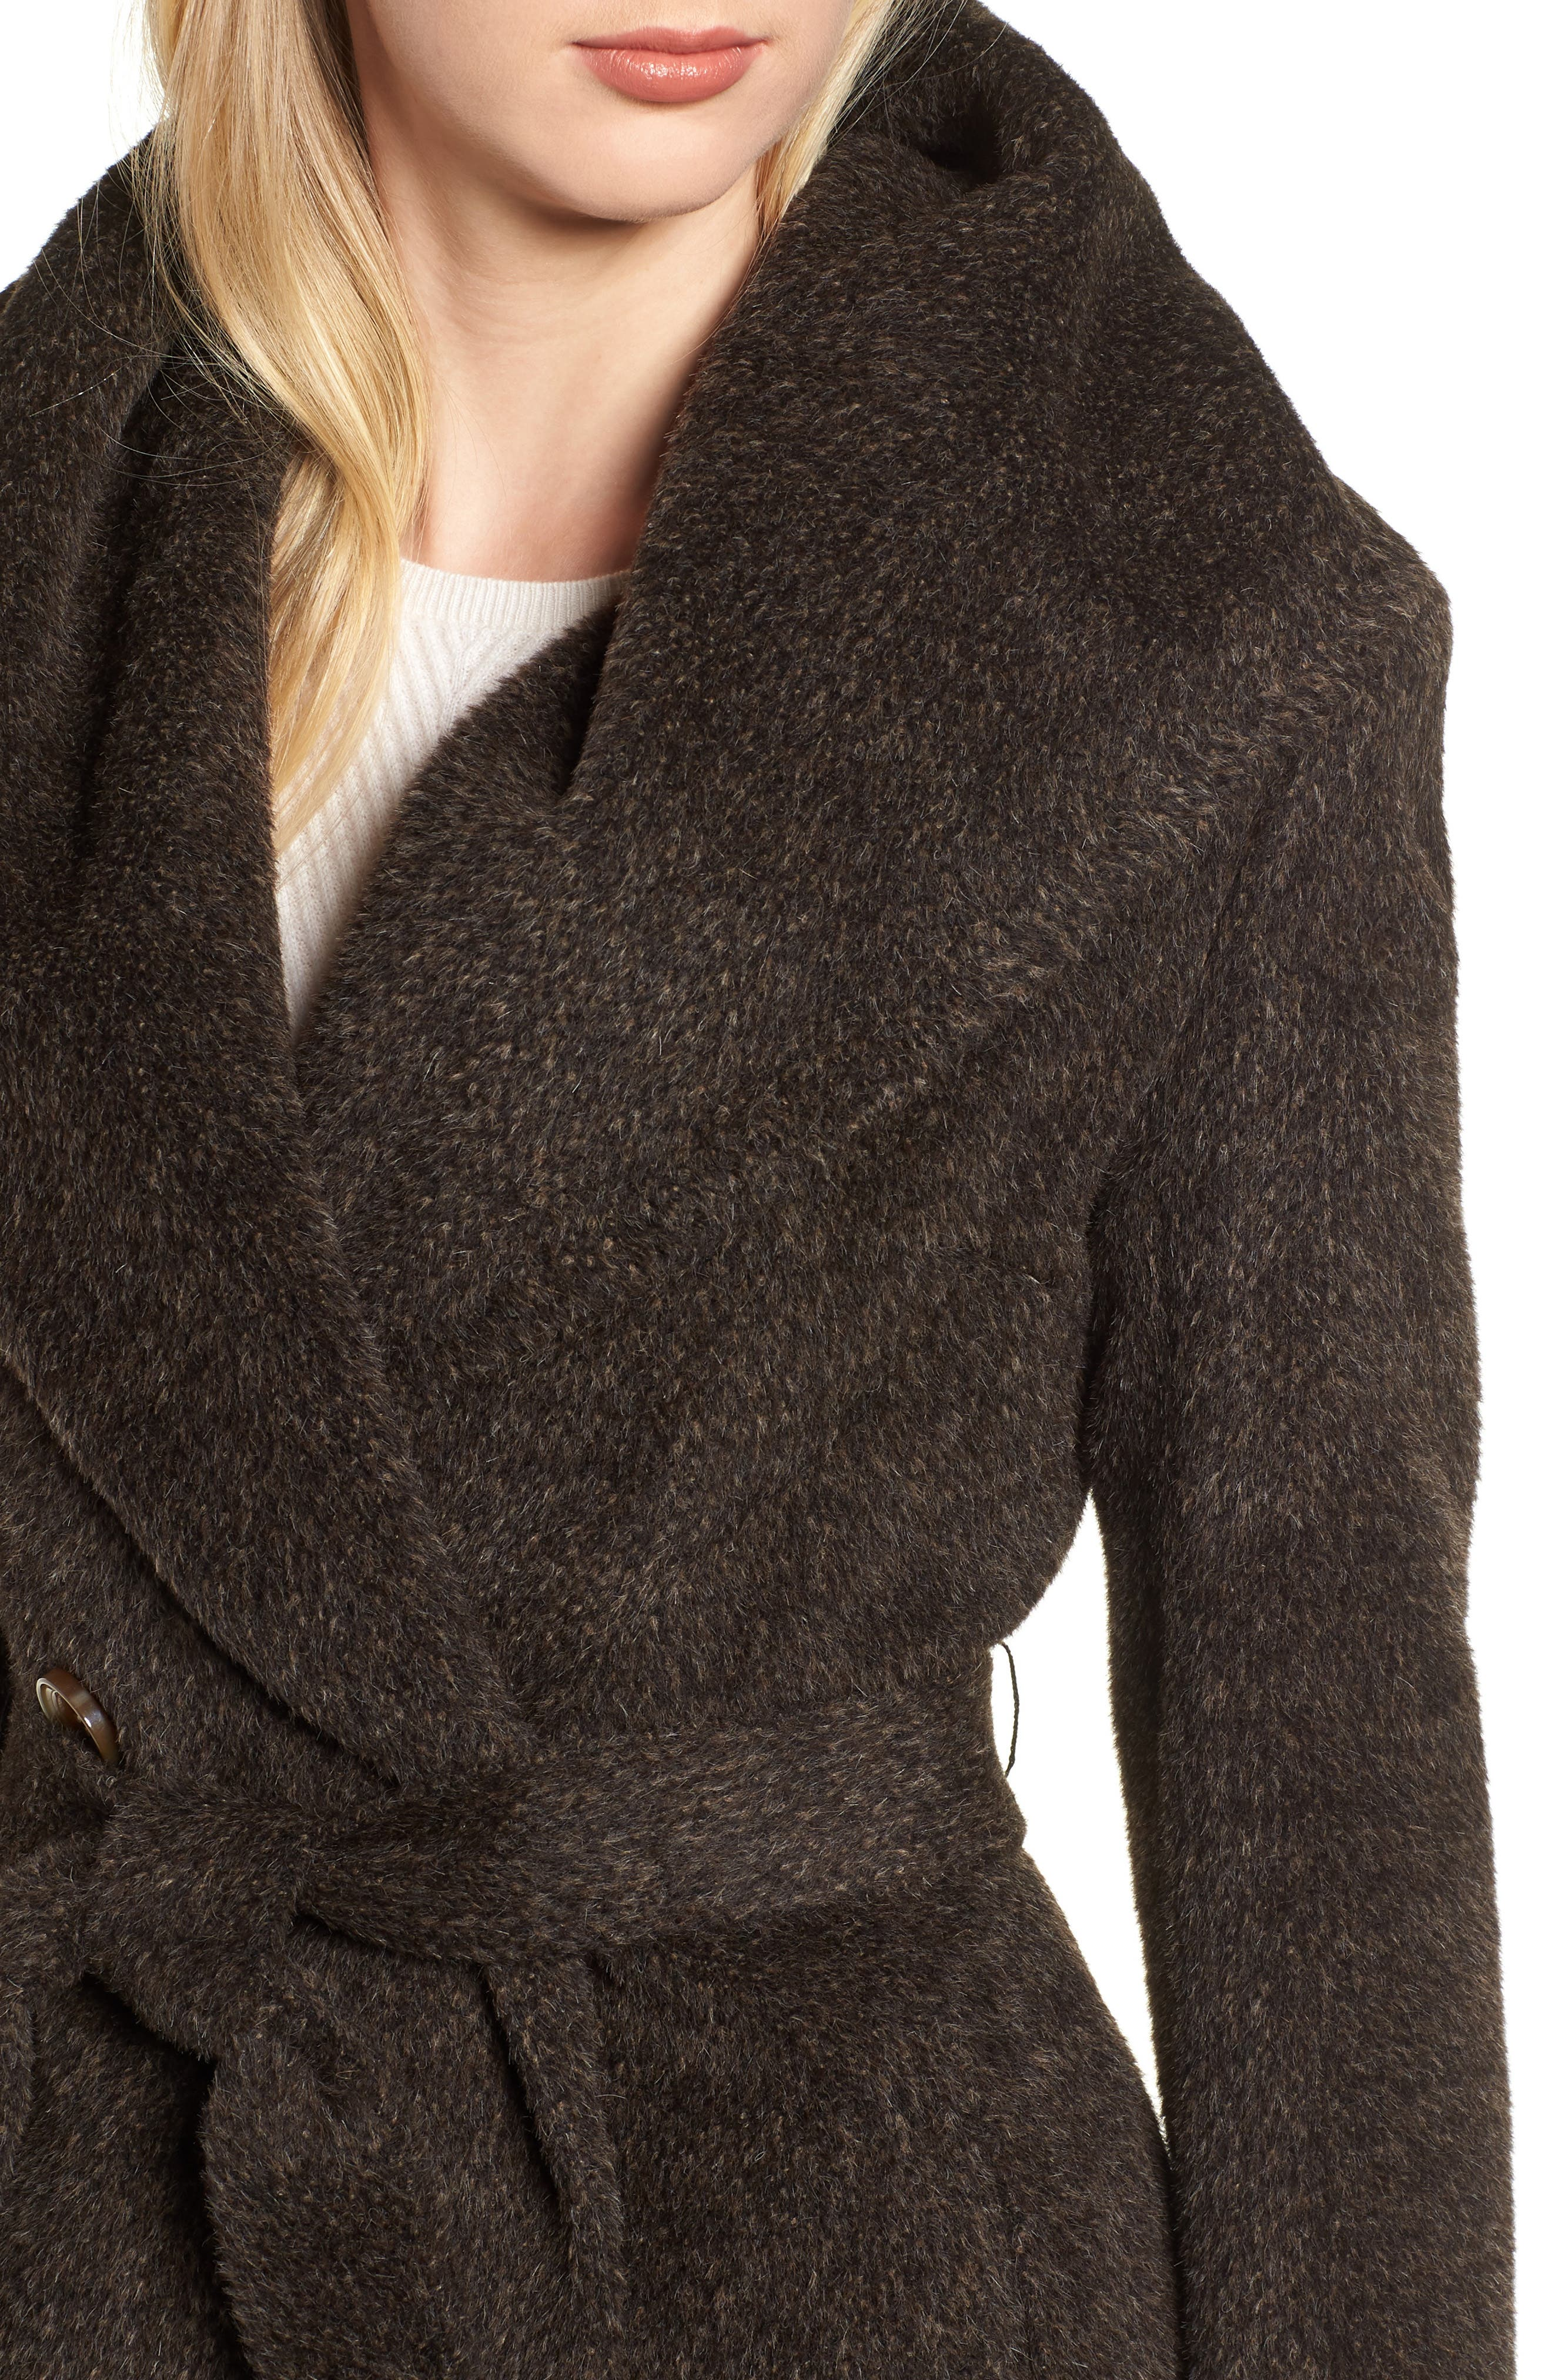 Grace Hooded Wrap Walker Coat,                             Alternate thumbnail 4, color,                             BROWN/ BLACK